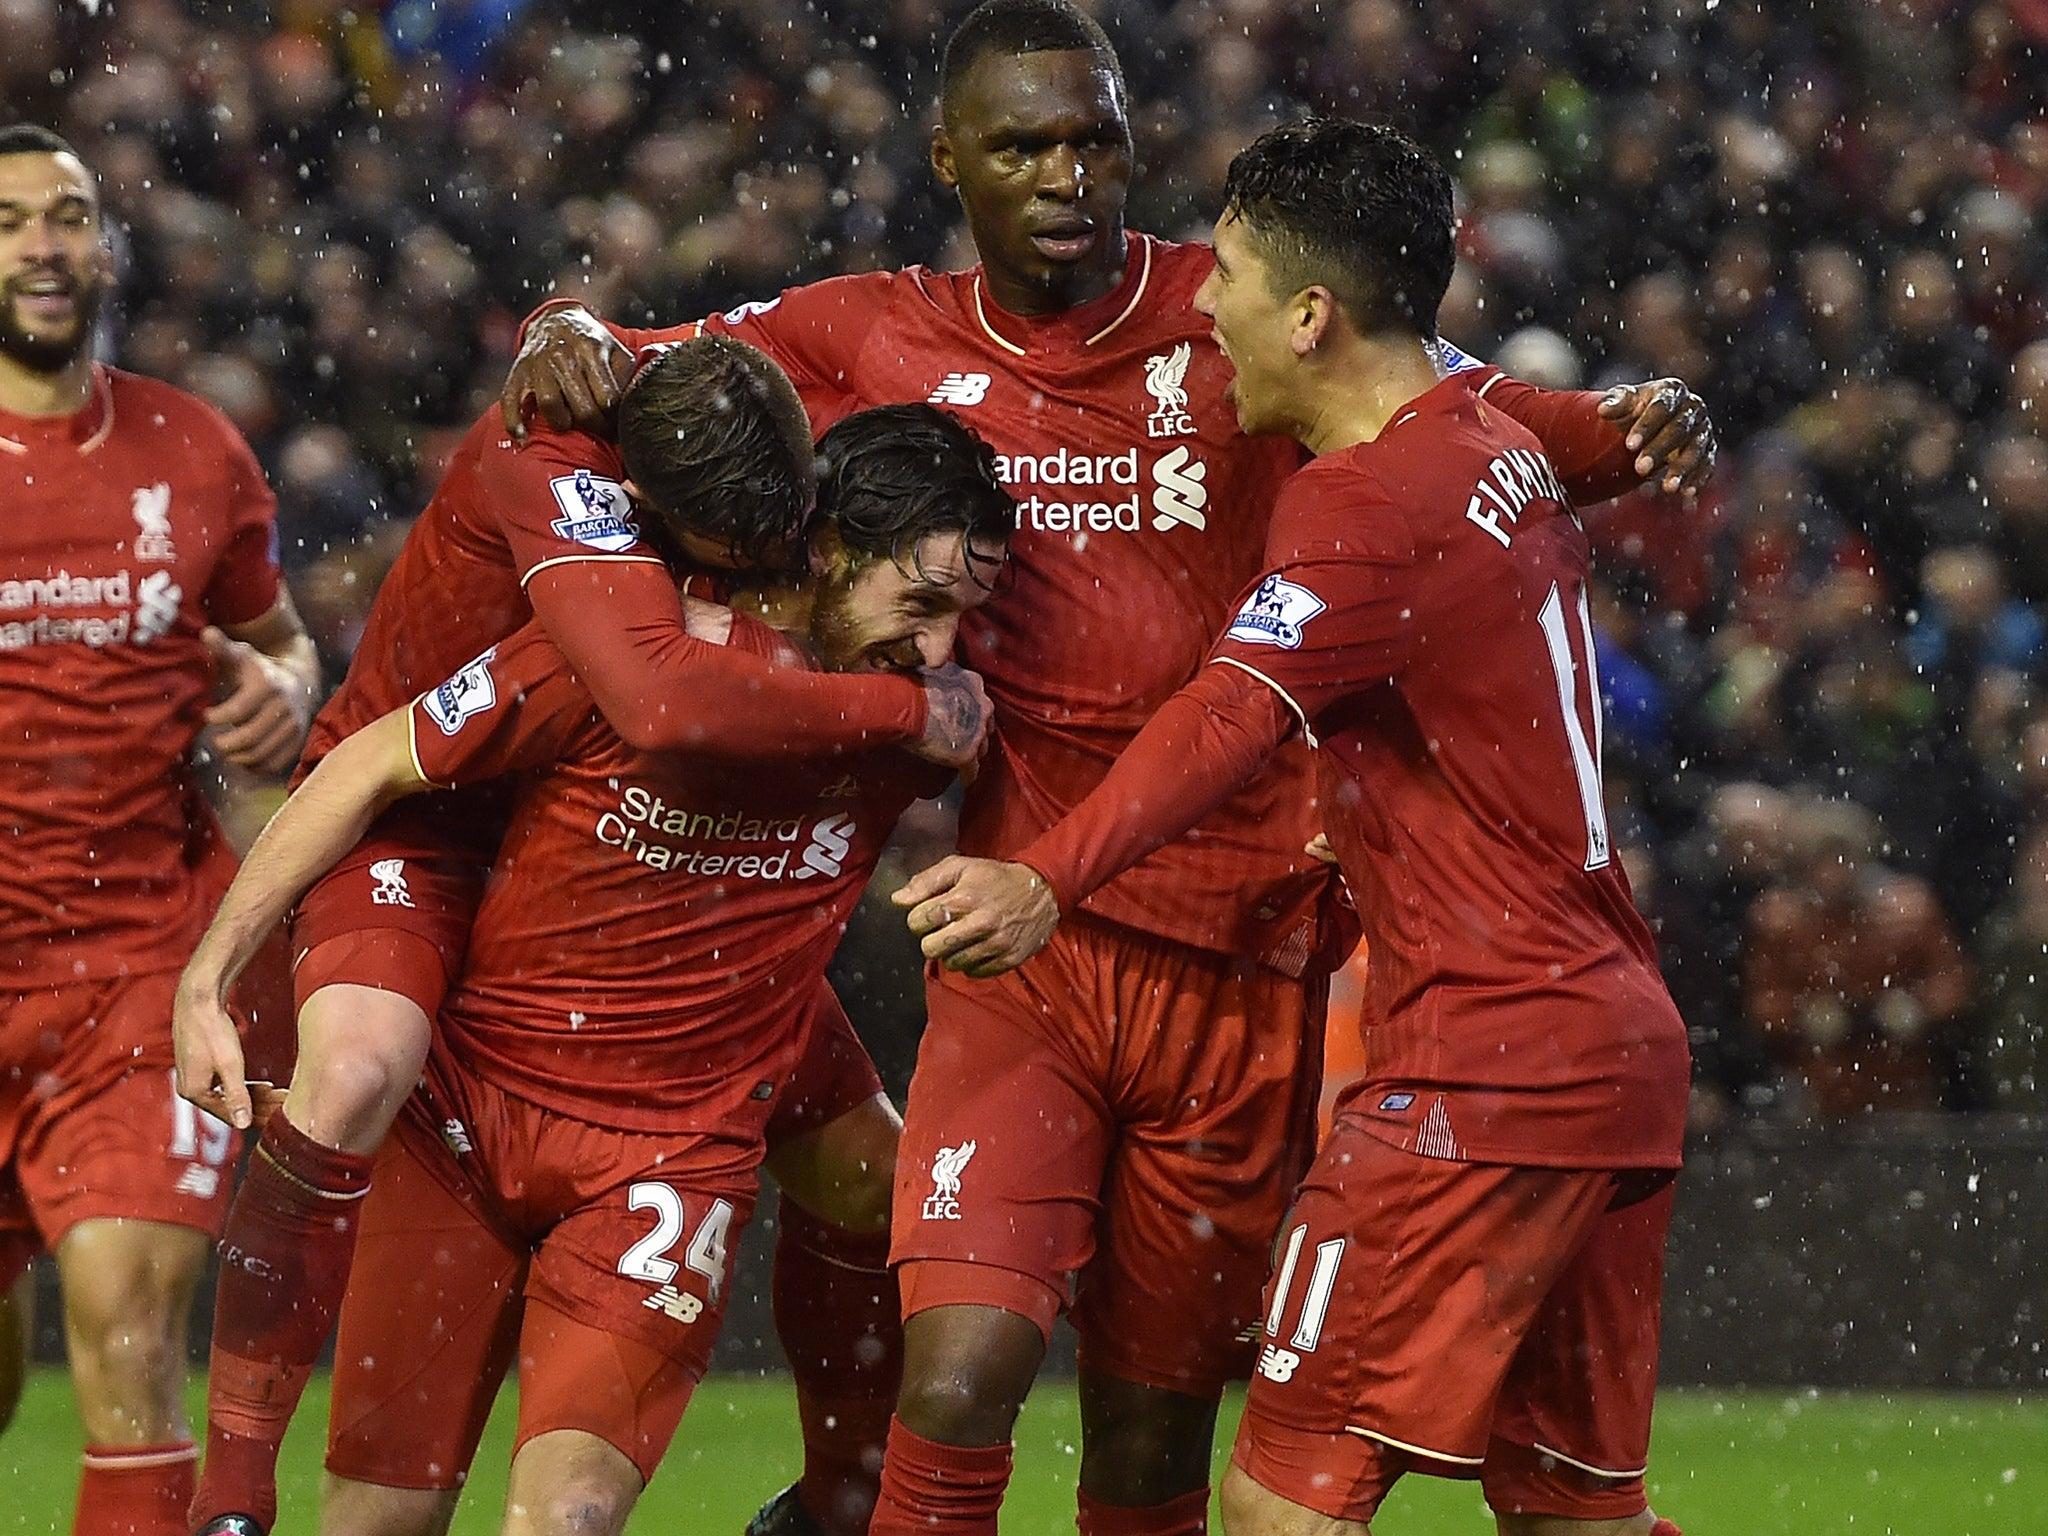 Liverpool vs Arsenal match report: Dramatic Joe Allen equaliser denies Gunners in thriller